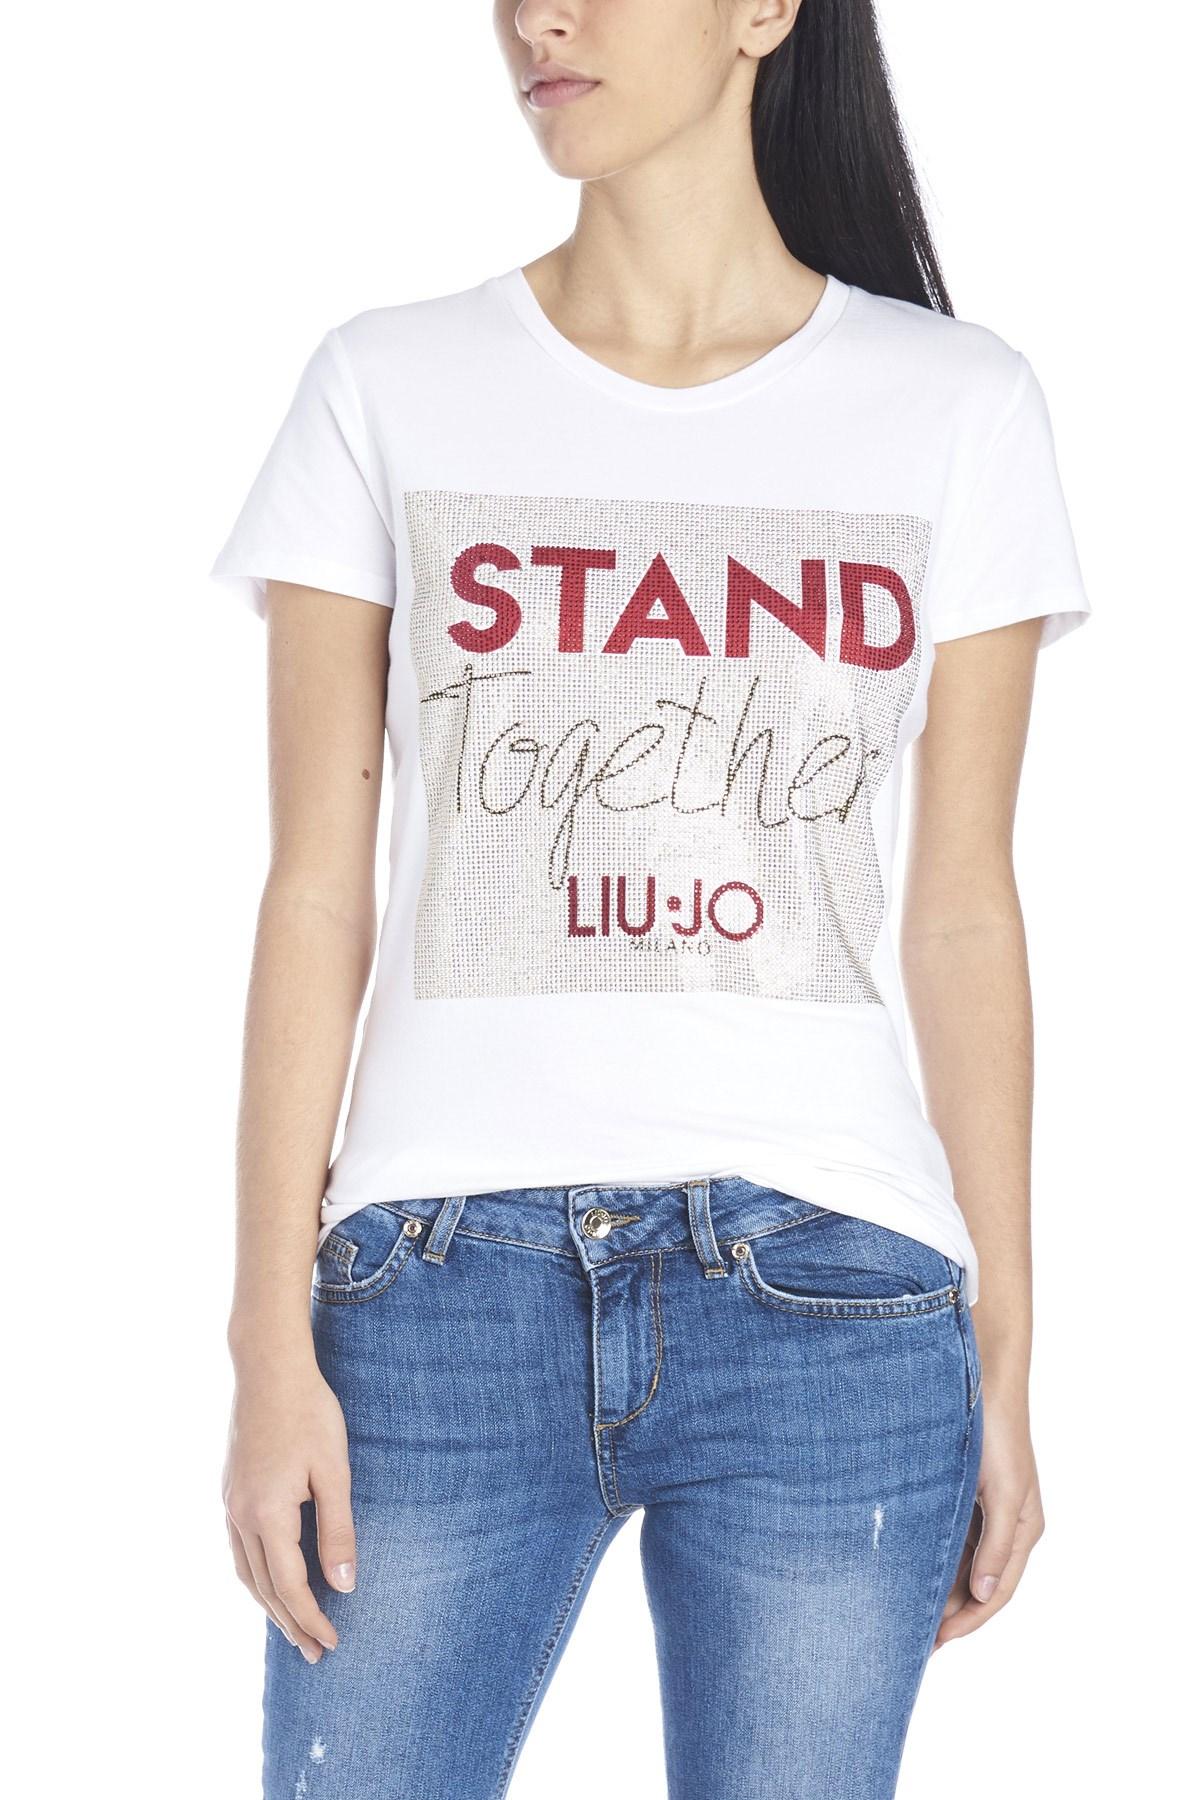 1a67ecb55c liu jo 'Stand together' t-shirt available on julian-fashion.com - 64259